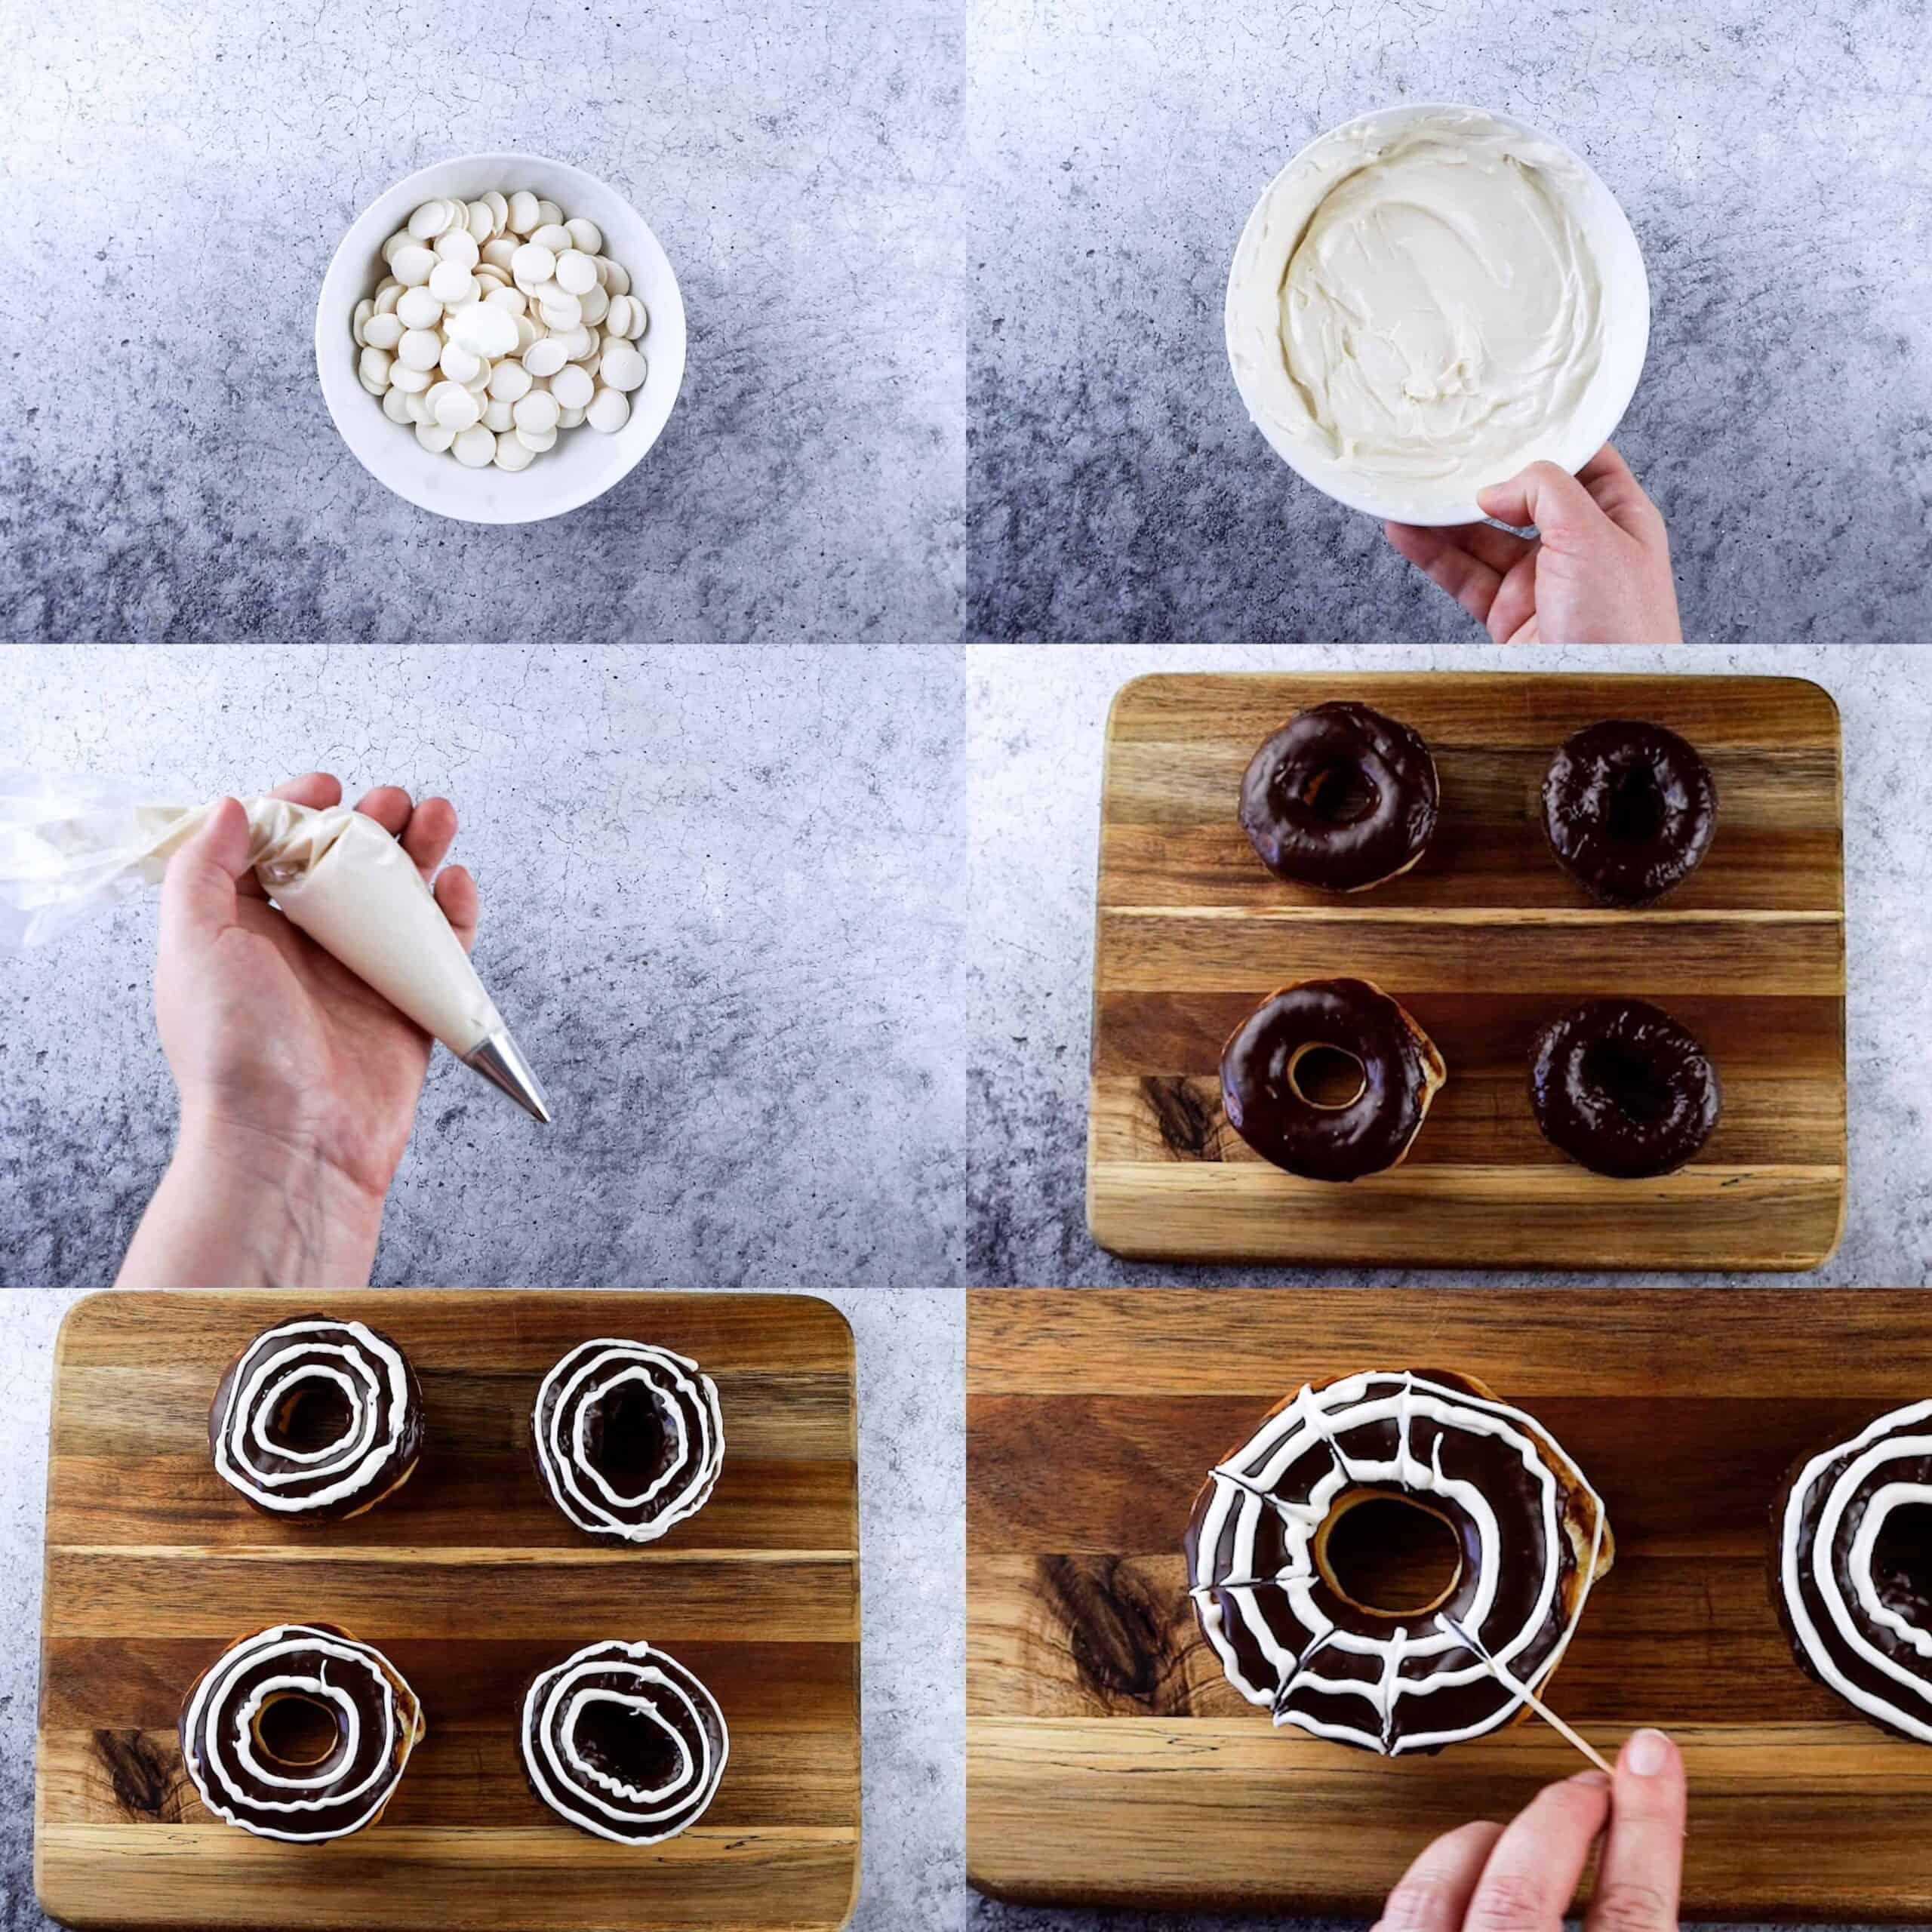 Spider web donuts decorating process shots